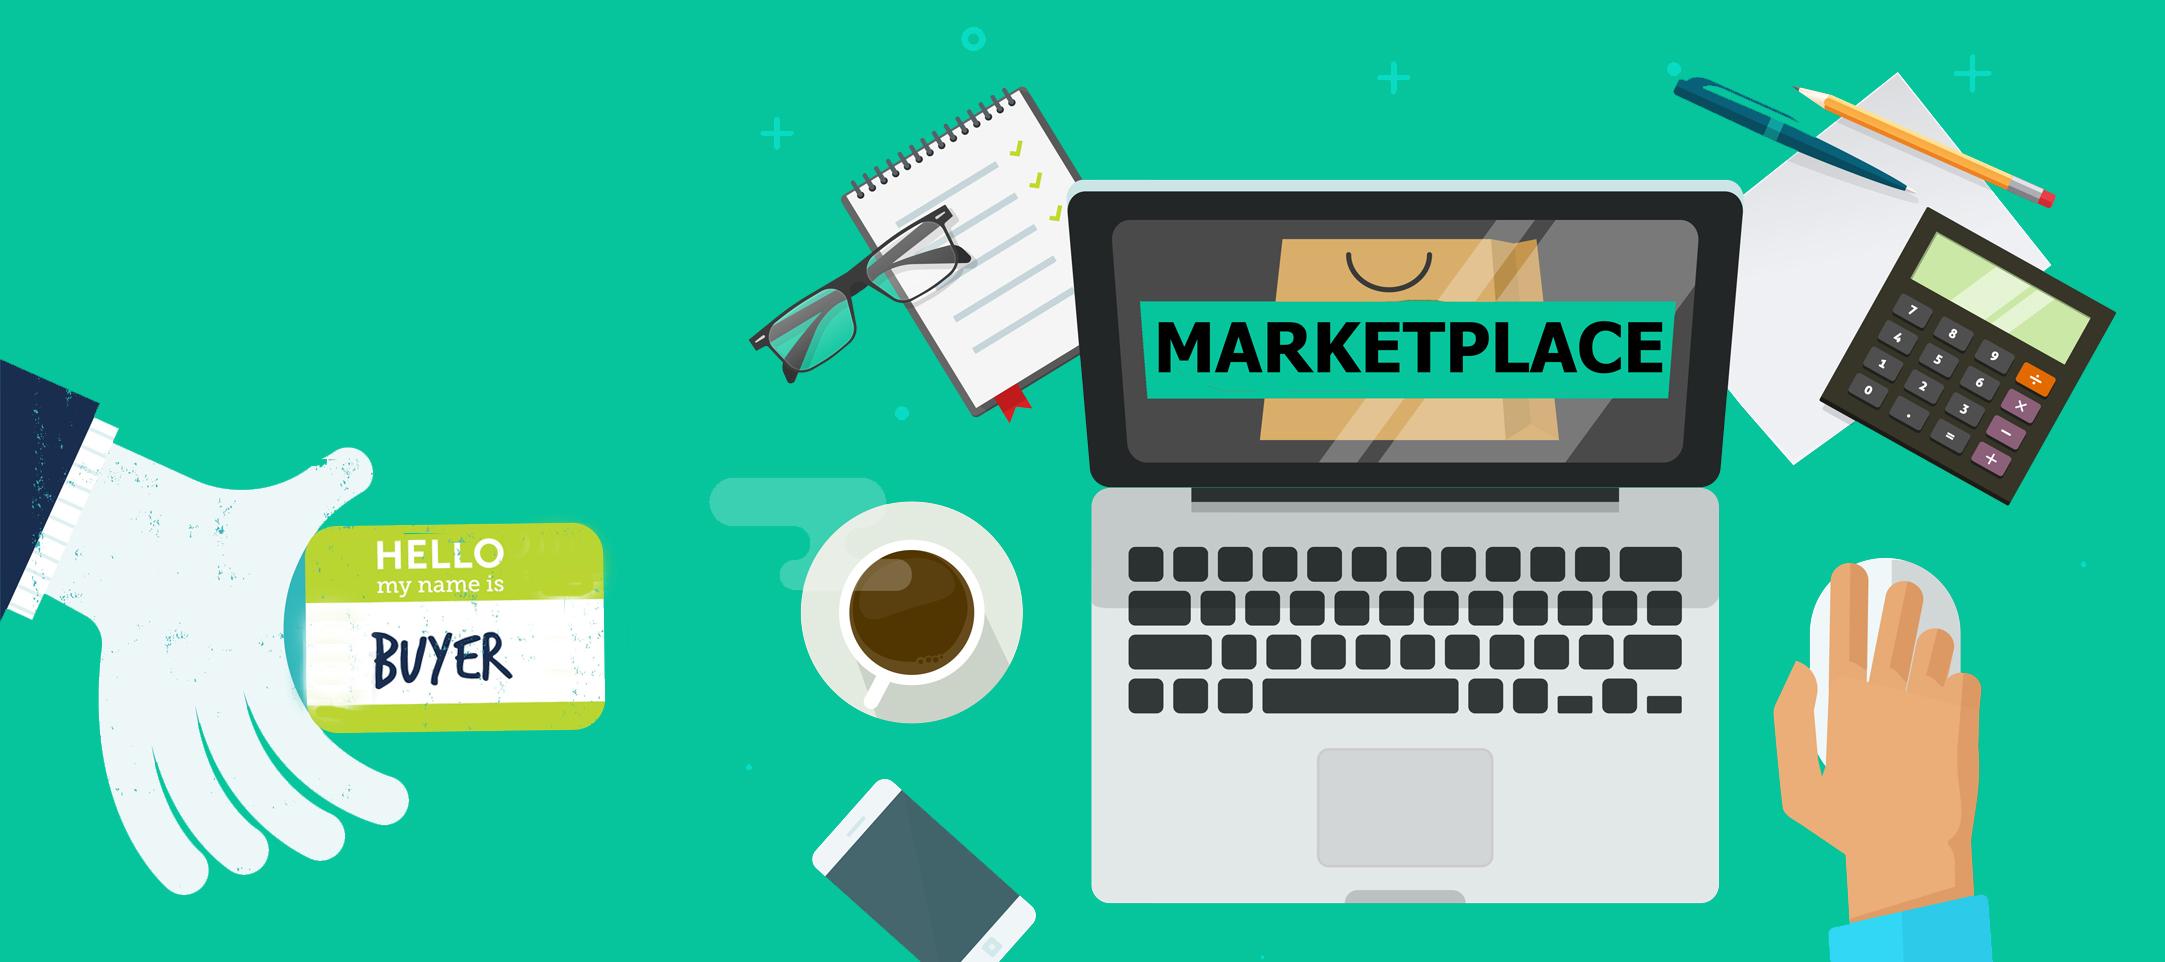 ICTFOOTPRINT.eu Online Marketplace